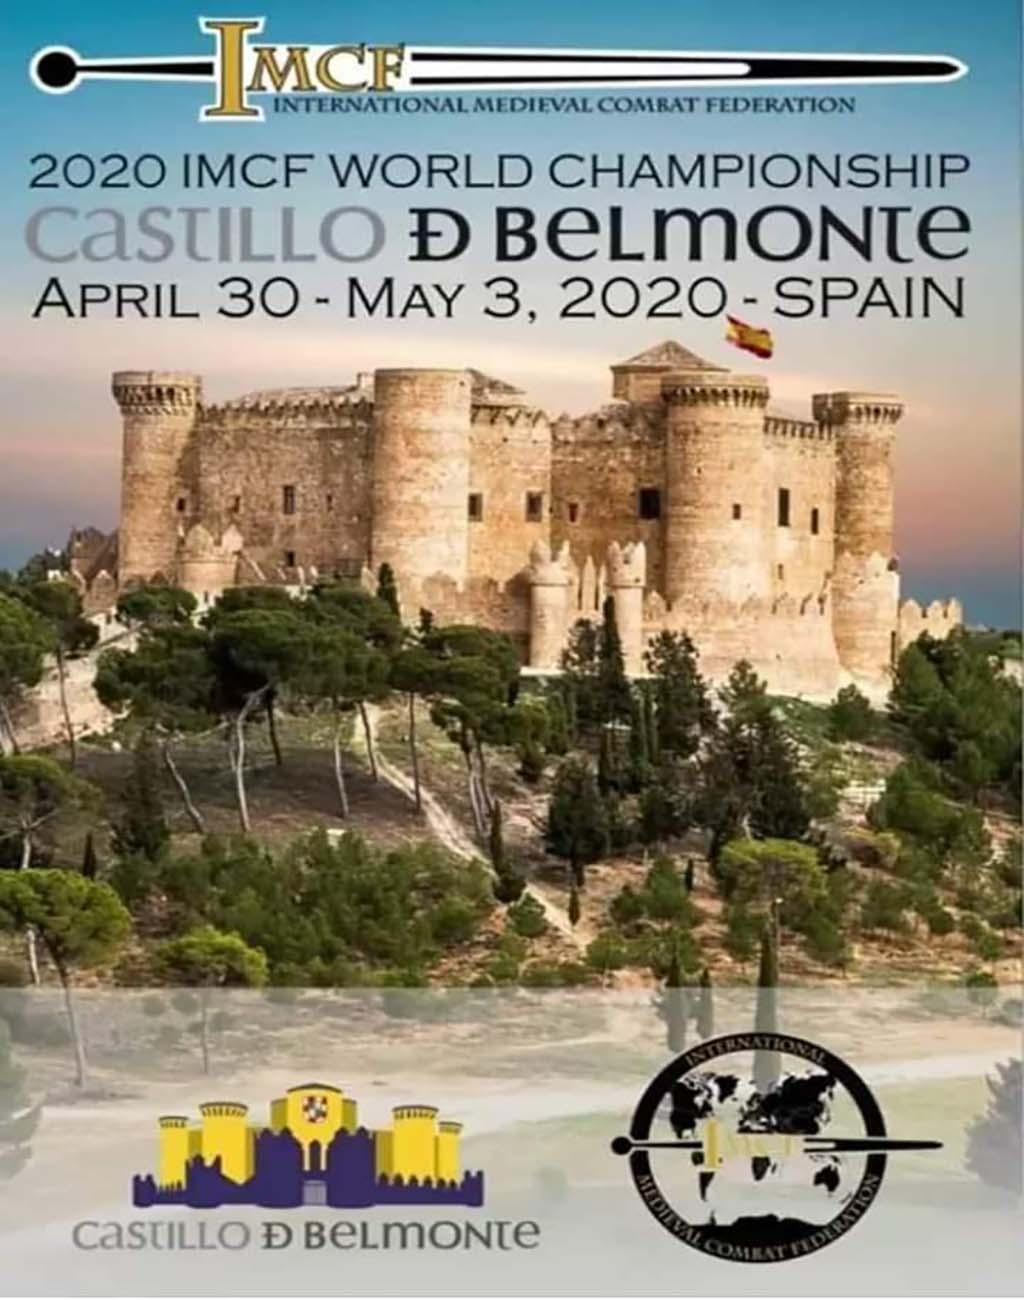 Campeonato Internacional de Combate Medieval IMCF (Belmonte)